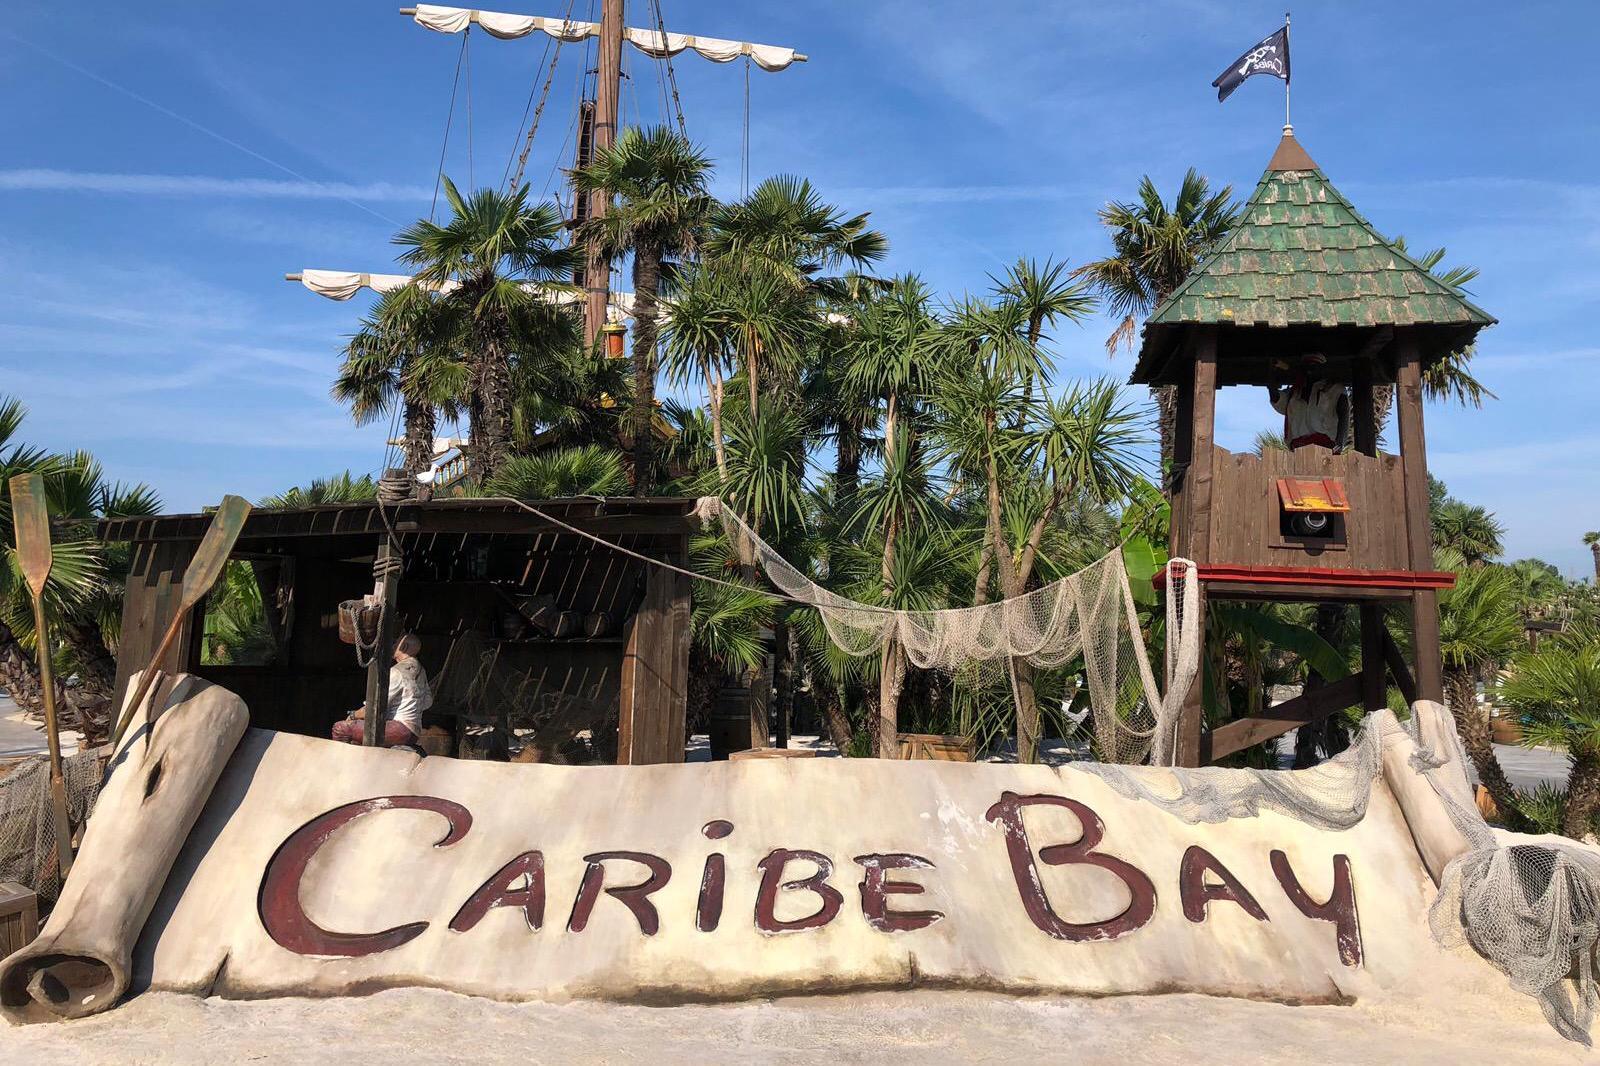 parco divertimento Caribe bay